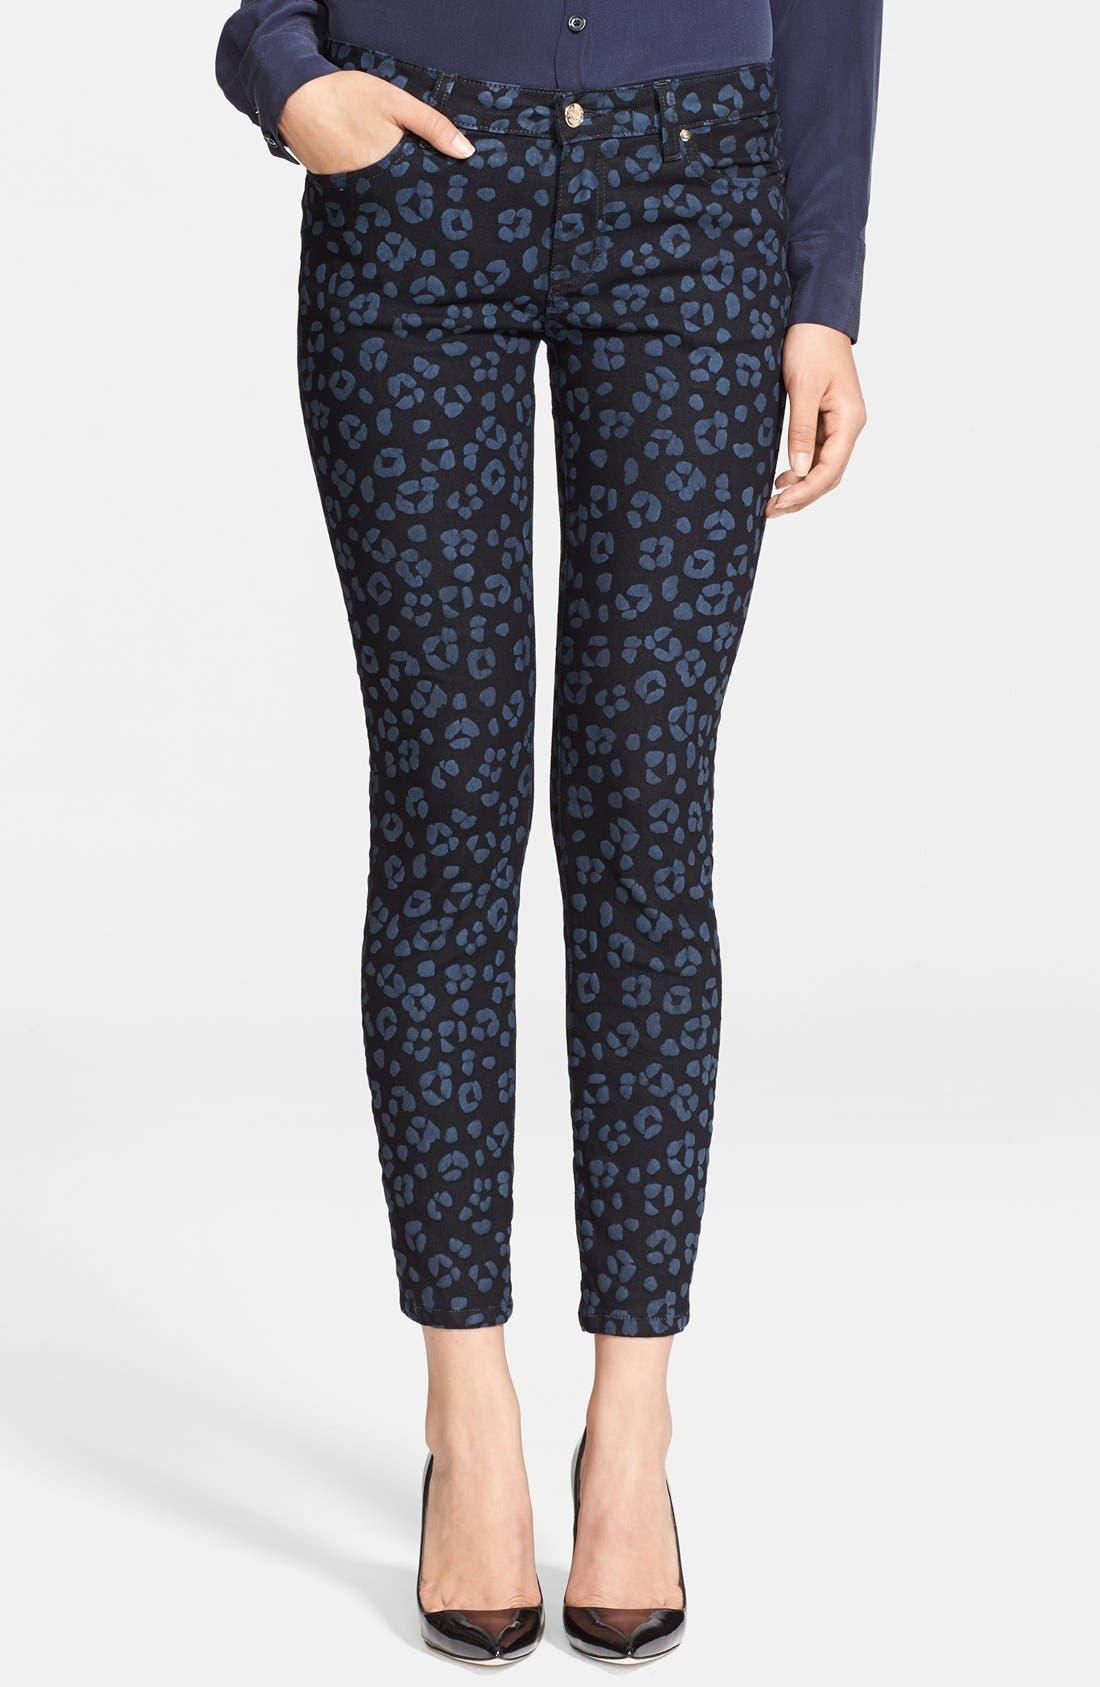 Alternate Image 1 Selected - kate spade new york 'broome street' cheetah print jeans (black)